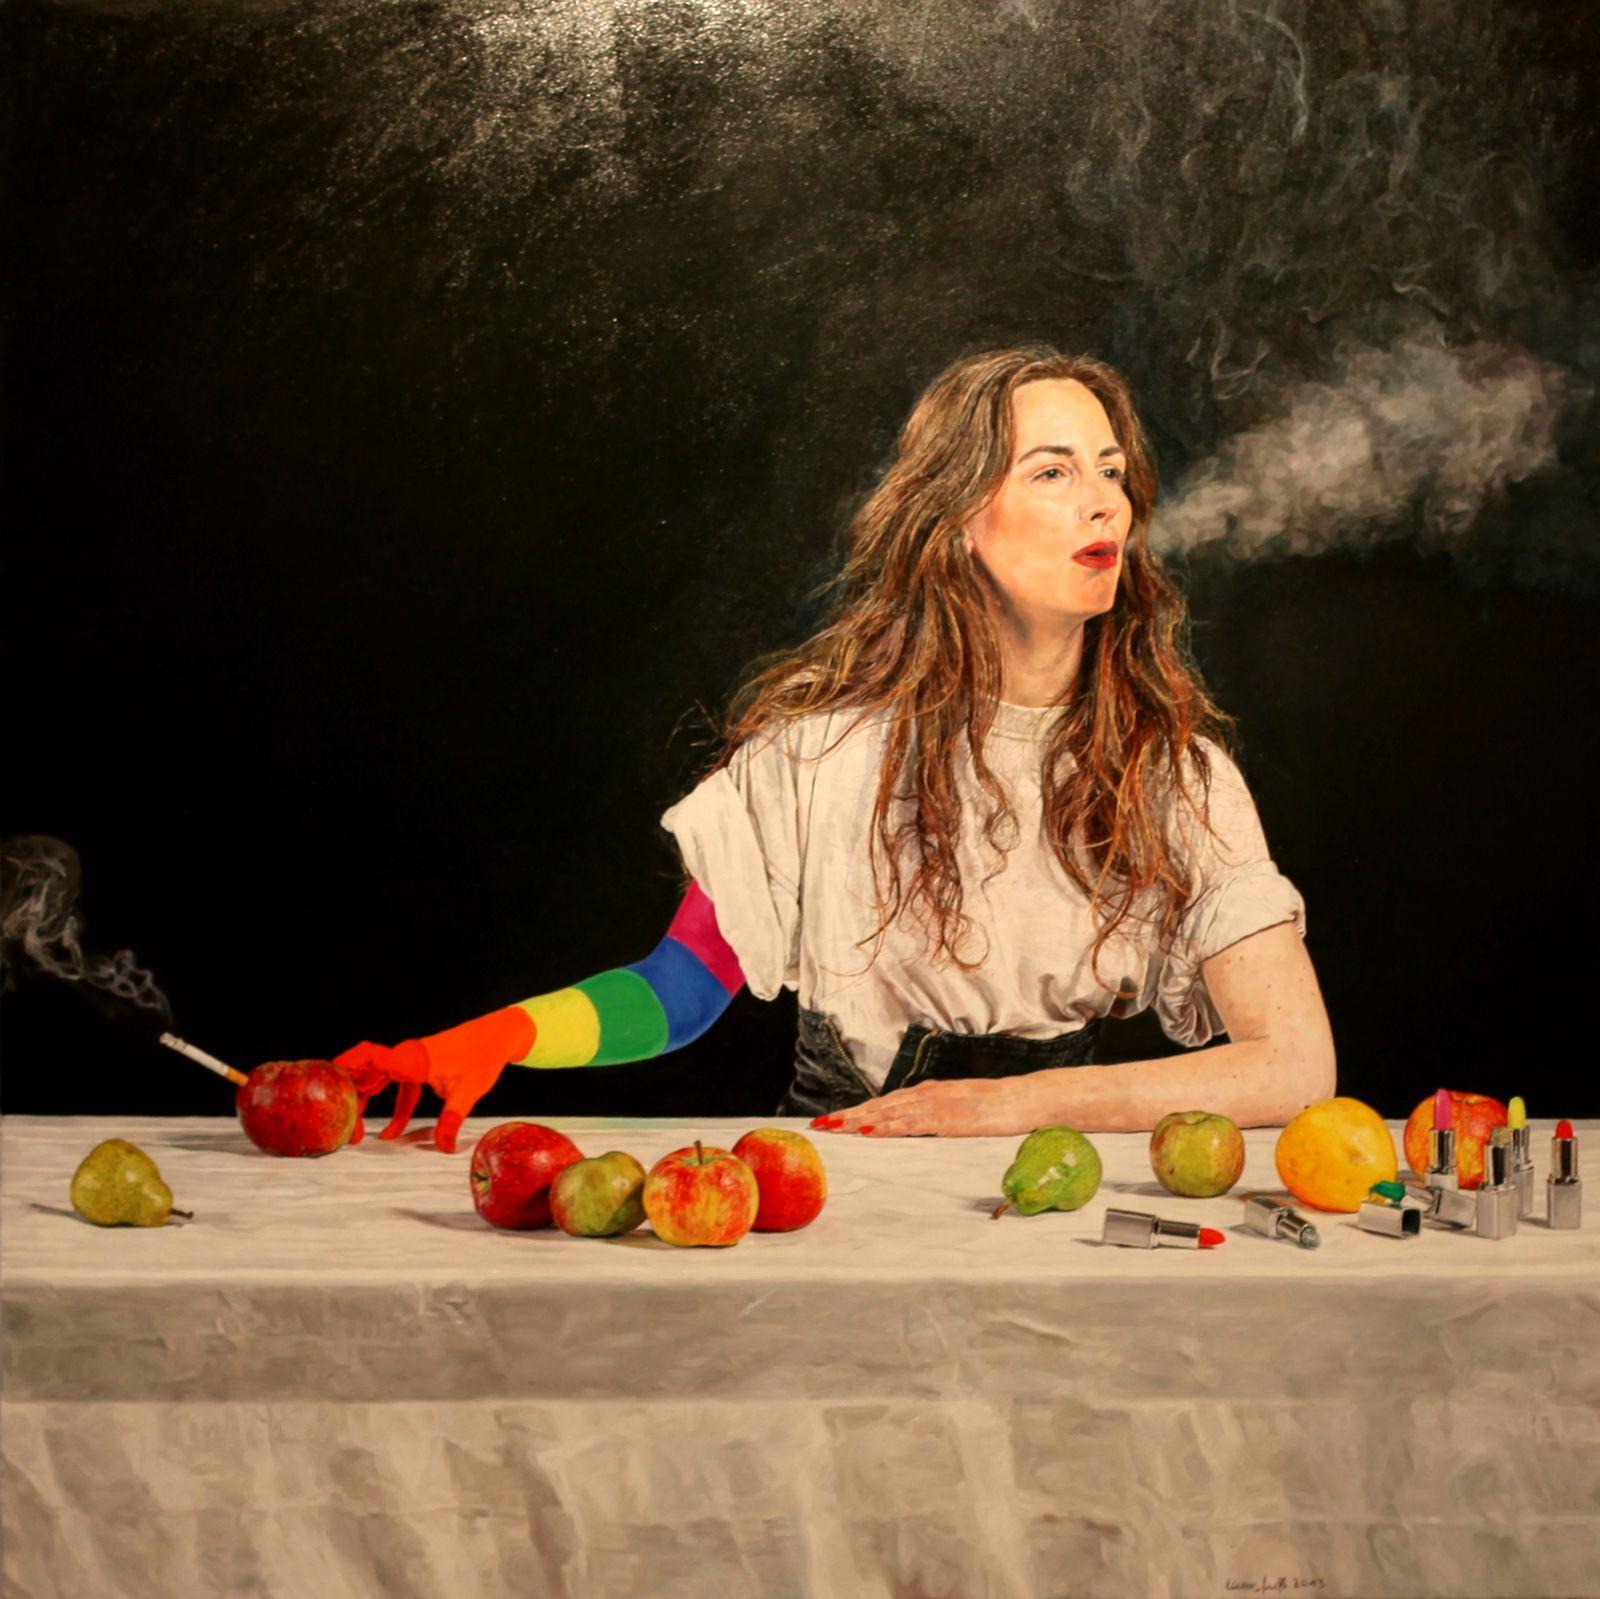 """Martin Zellerhoff, Arises"", 2013  d'Ulrich Lamsfuss  Courtesy Galerie Daniel Templon © Photo Éric Simon"